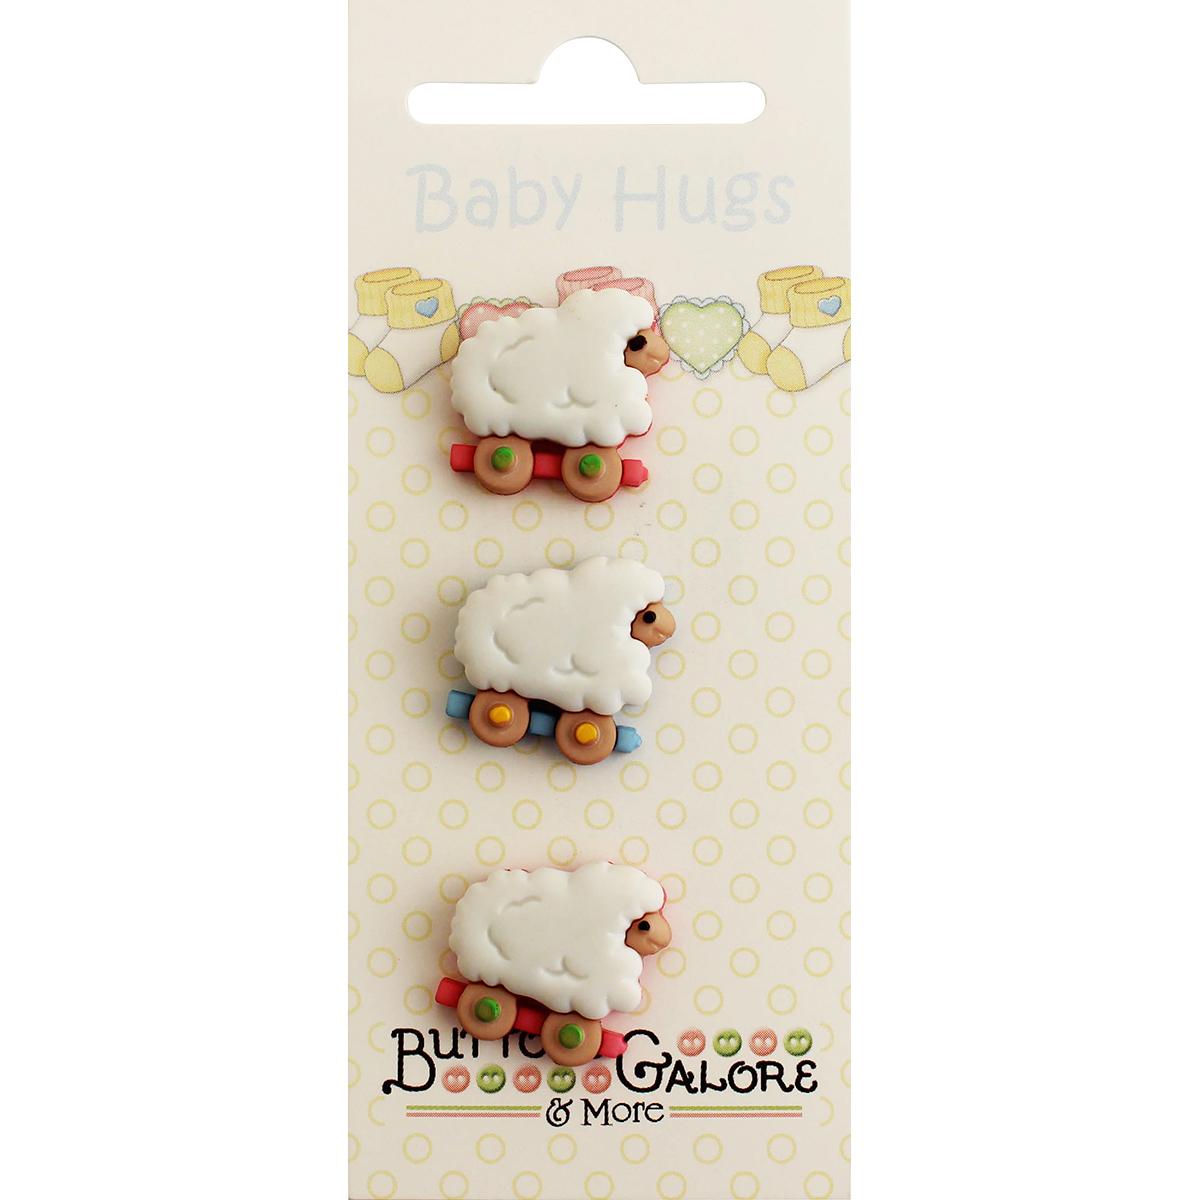 Sheep Buttons Baby Hugs